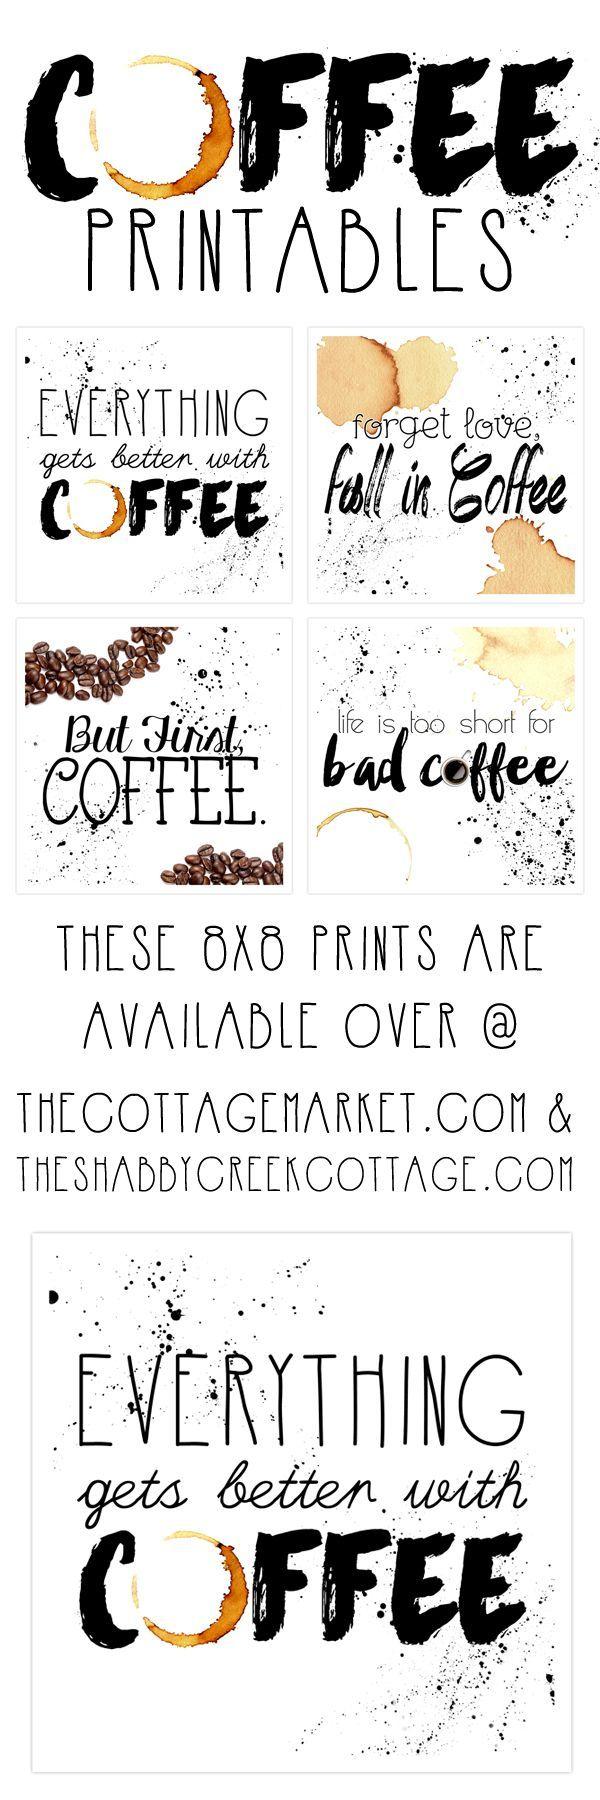 Free Printable Art: The Coffee Collection | Fabulous Diy Home Decor - Free Printable Coffee Bar Signs